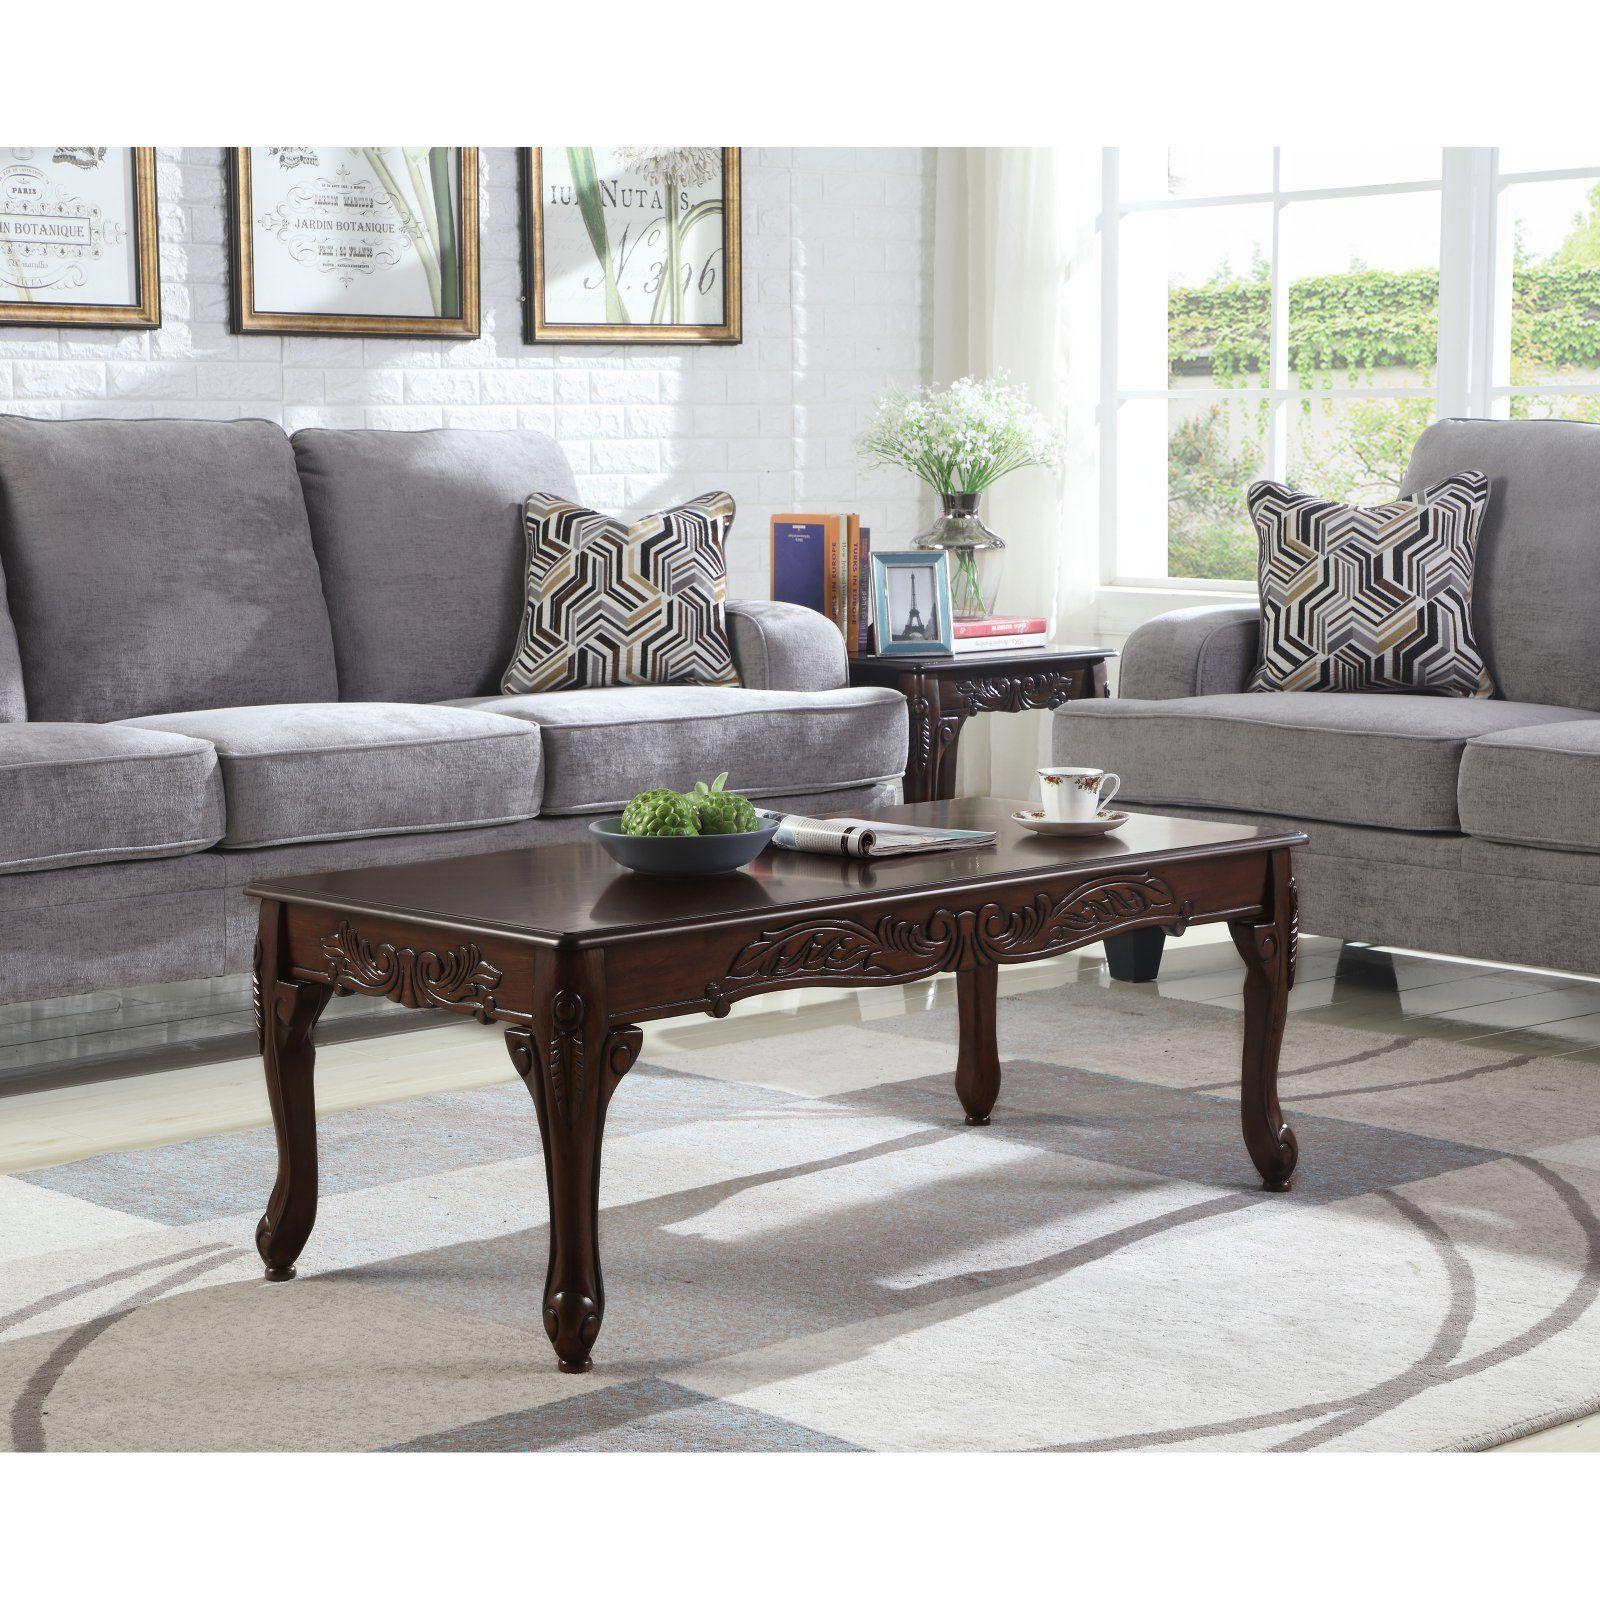 18+ Walmart grey living room furniture ideas in 2021